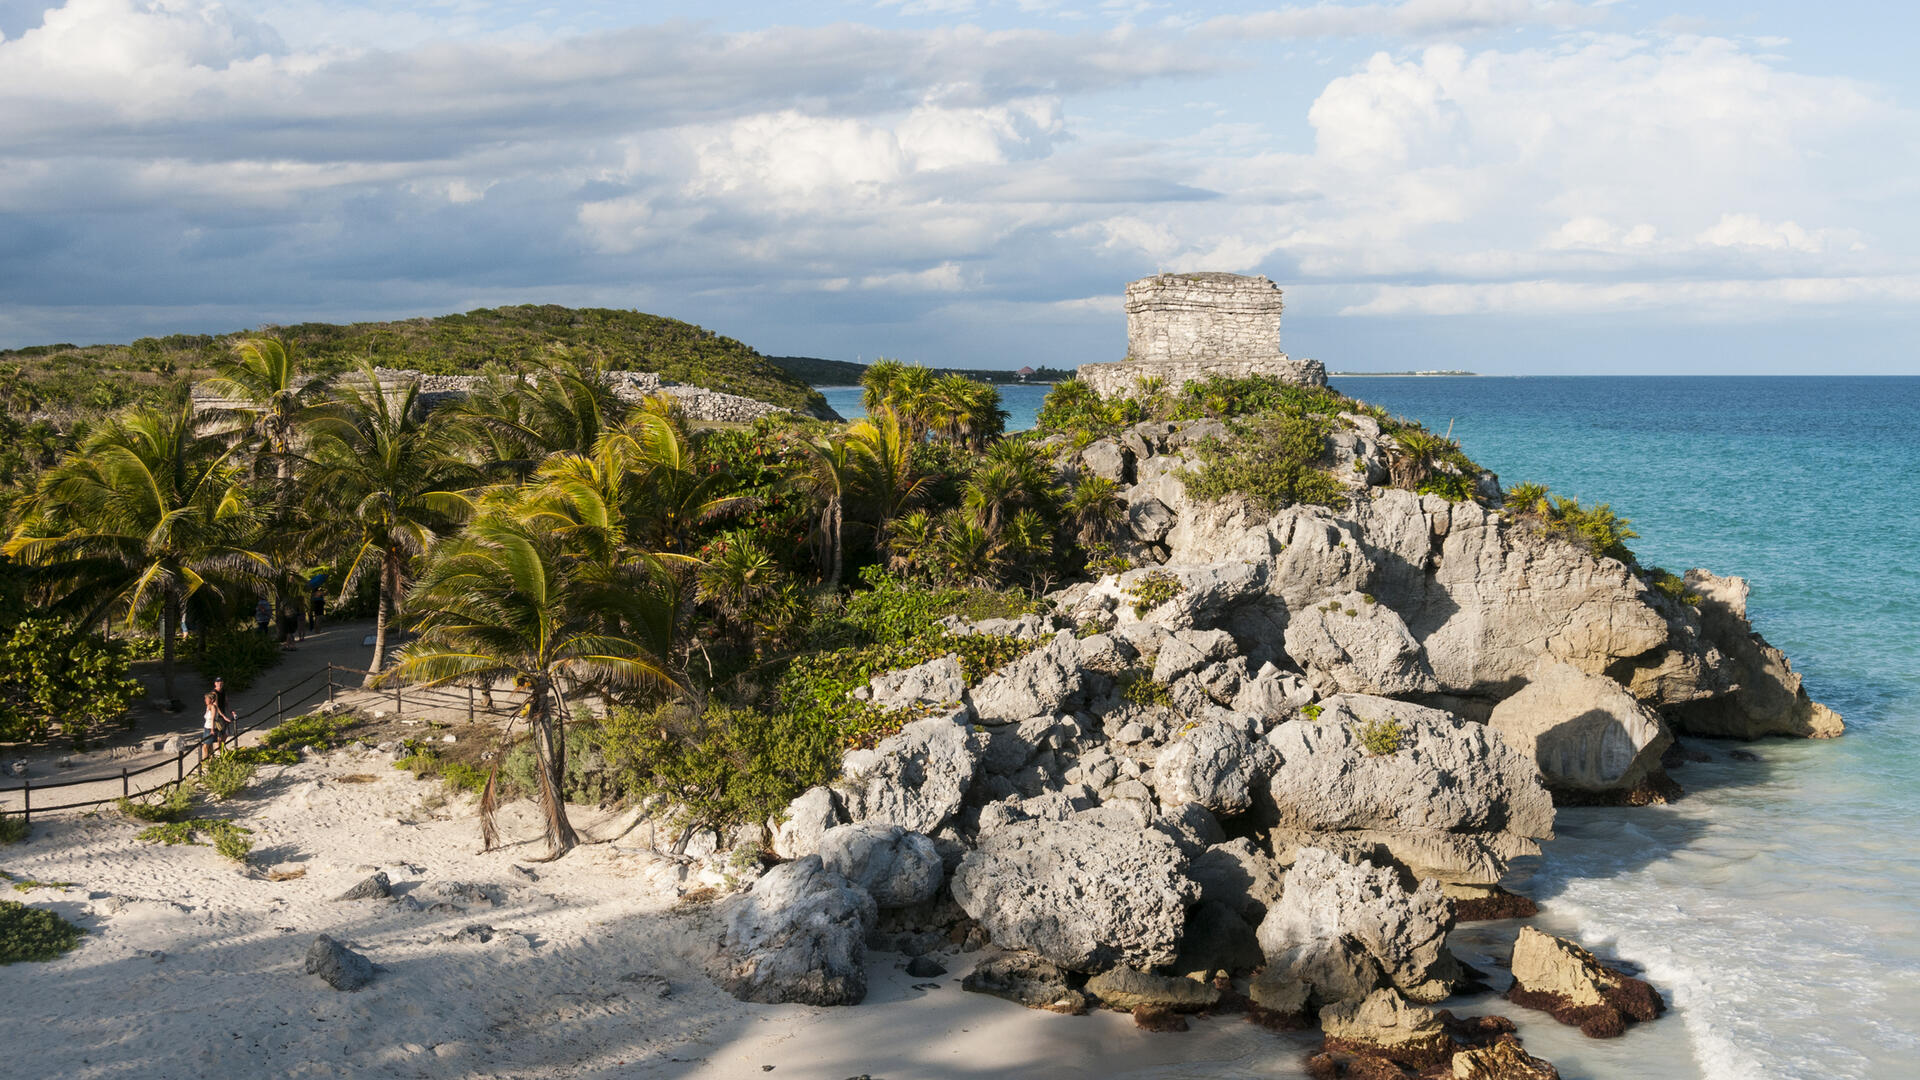 Yucatan limestone formations